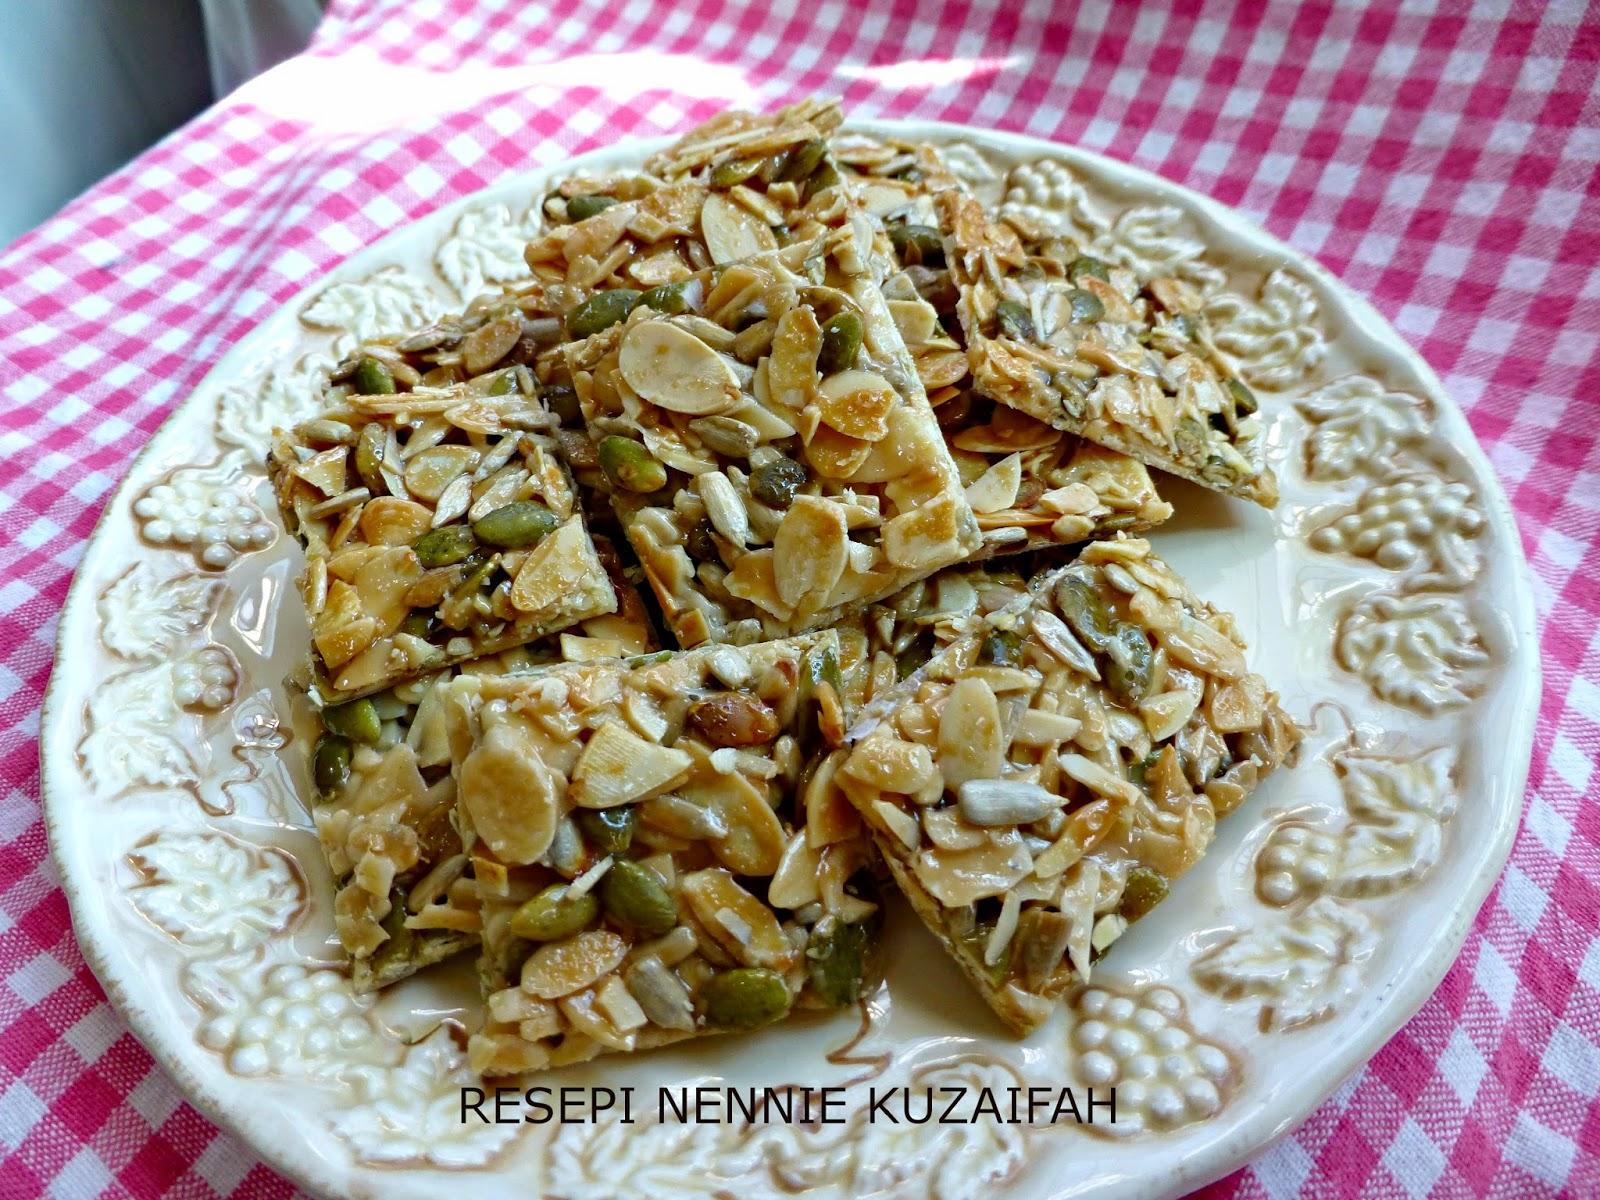 RESEPI NENNIE KHUZAIFAH: Florentine cookies